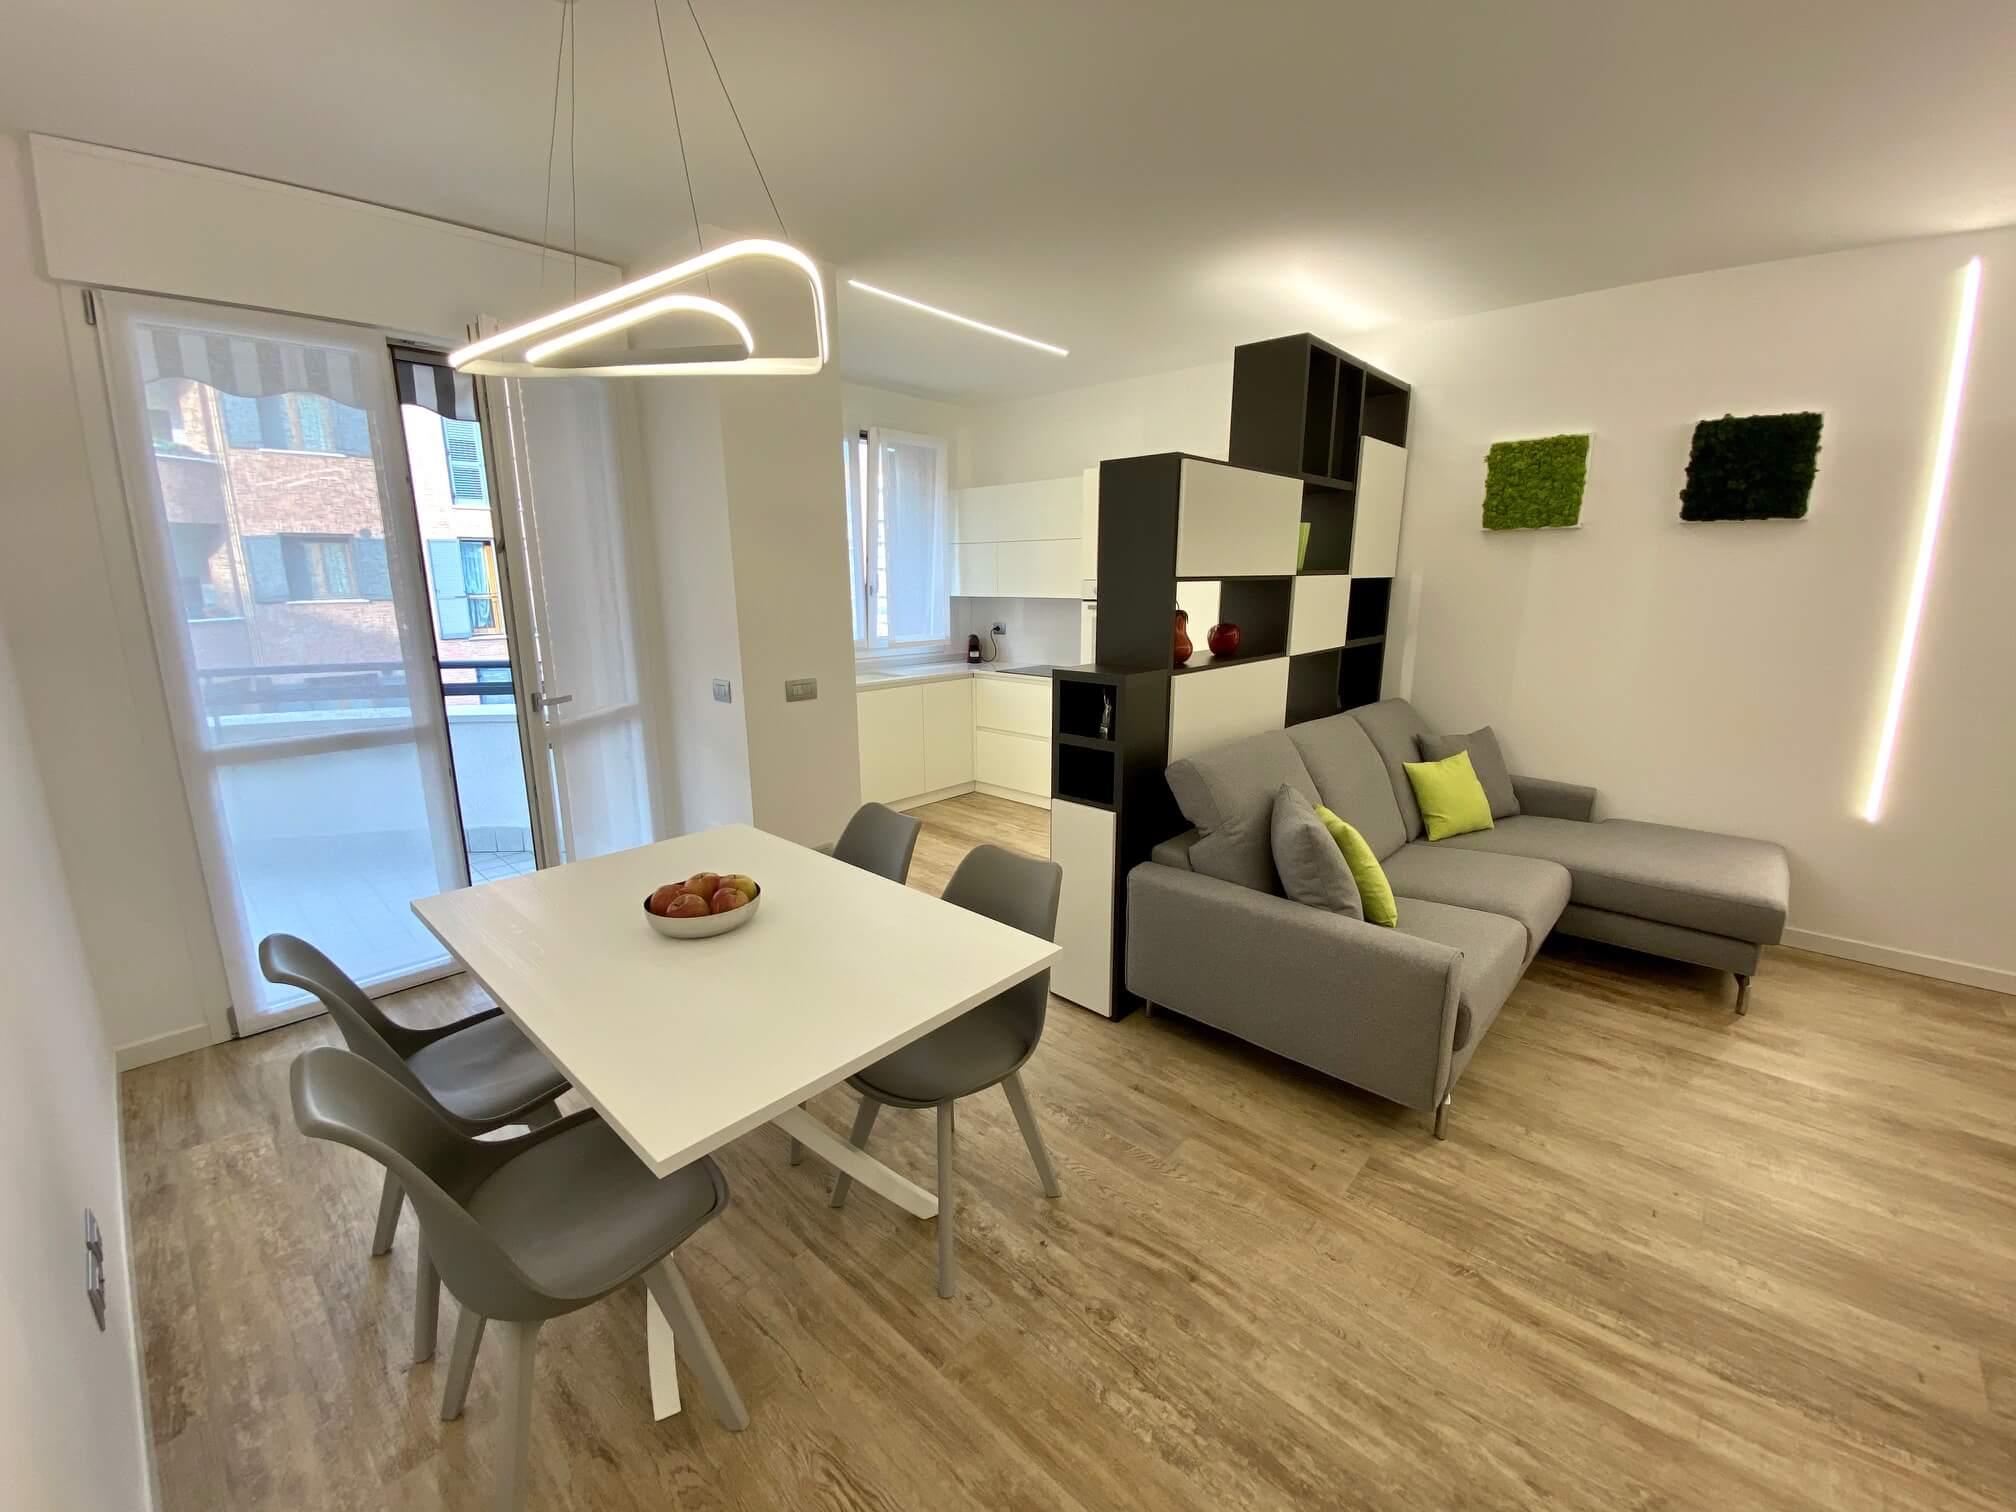 Apartment FSV  14.jpg